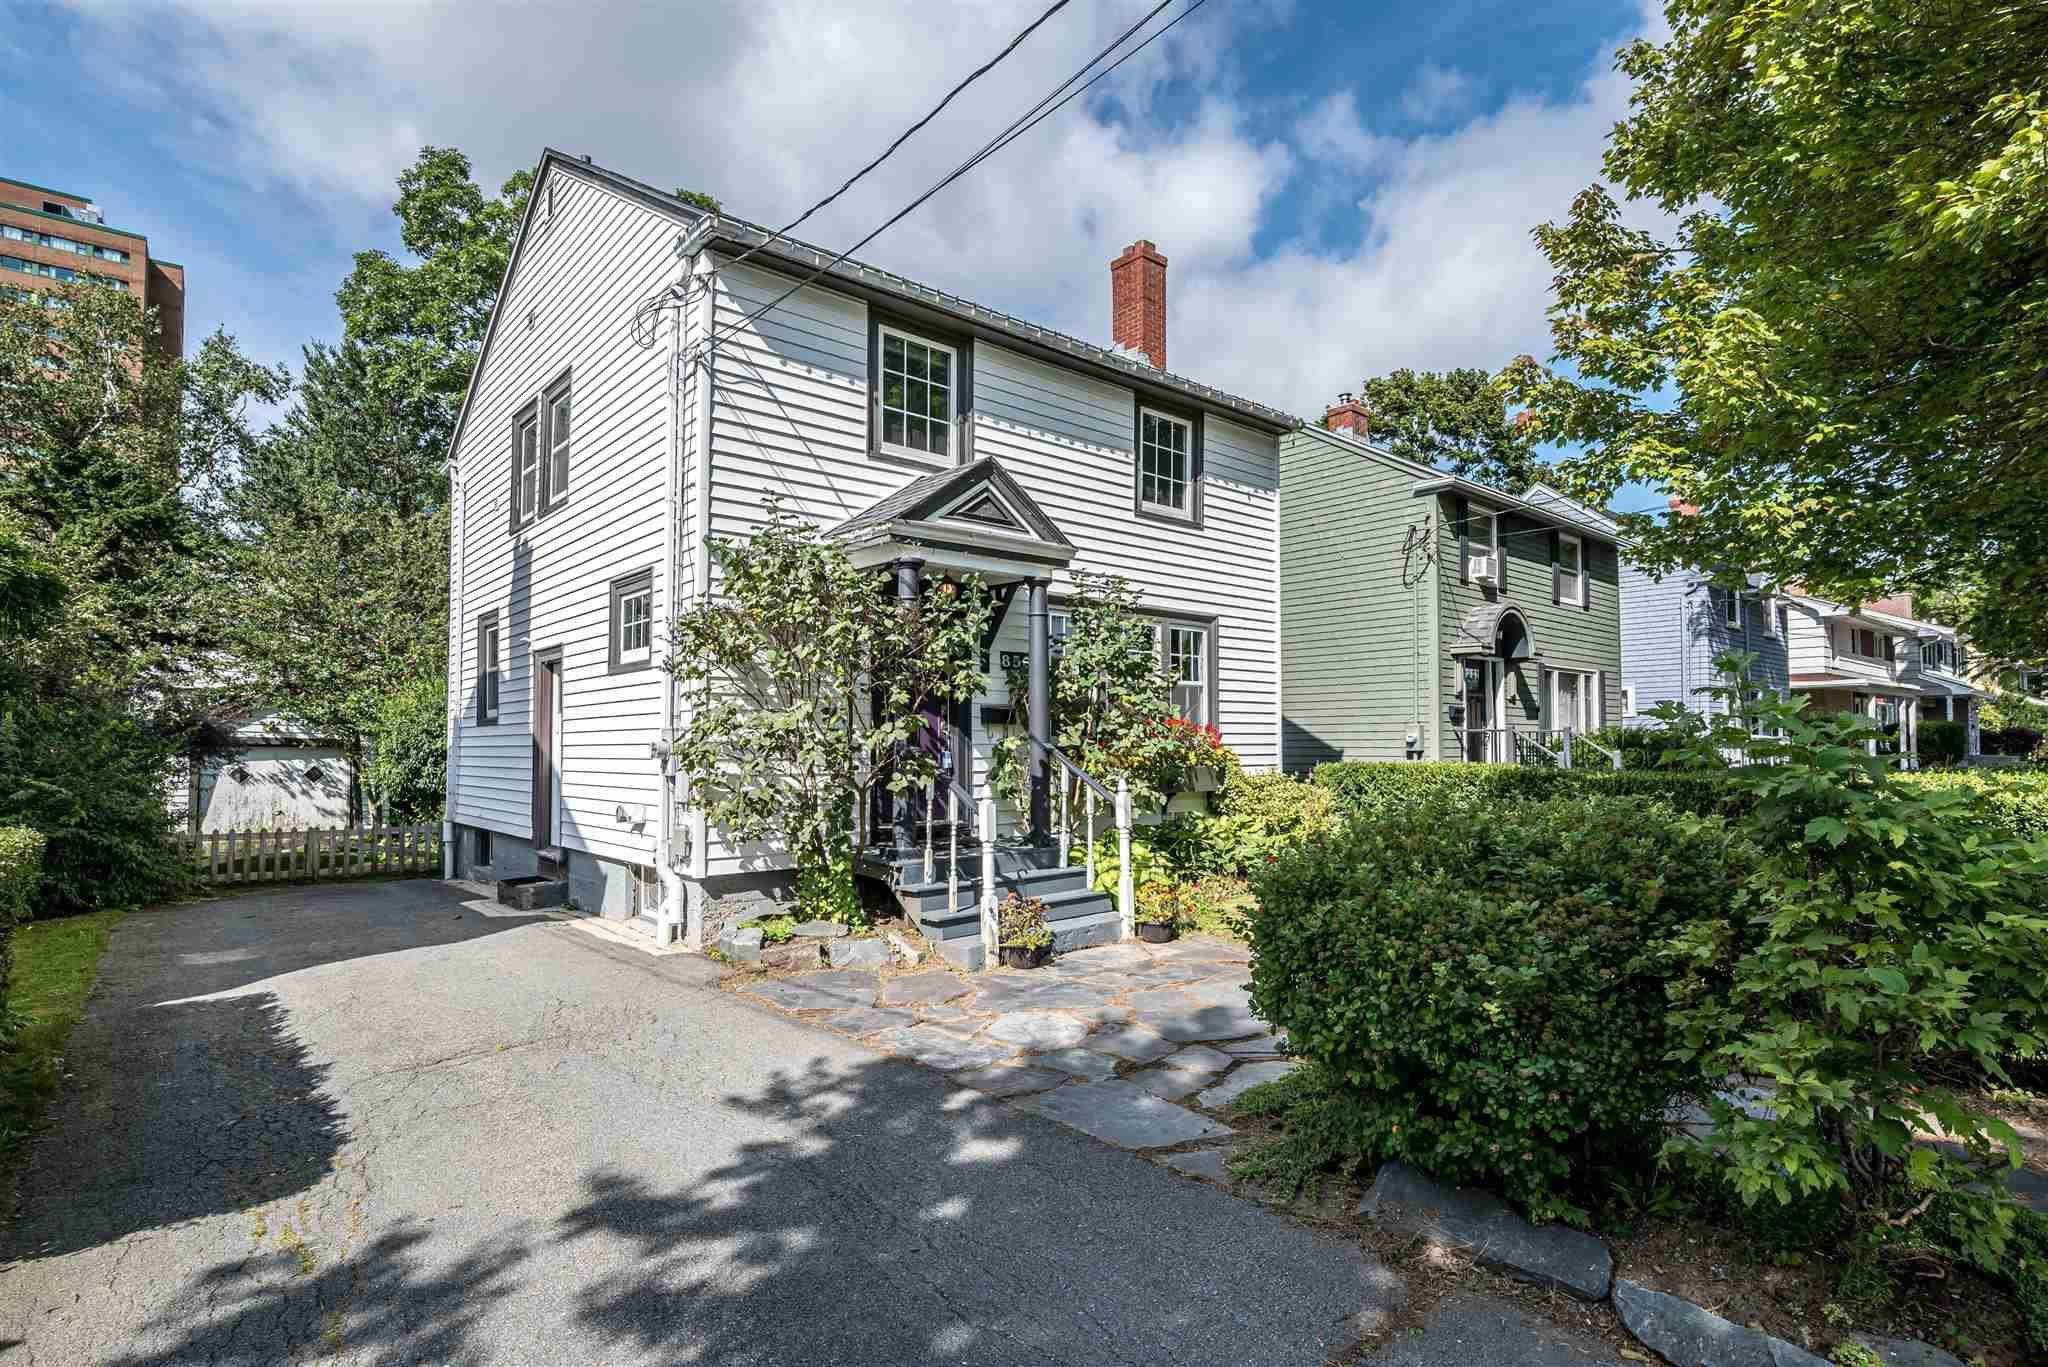 Main Photo: 856 Bridges Street in Halifax: 2-Halifax South Residential for sale (Halifax-Dartmouth)  : MLS®# 202119807